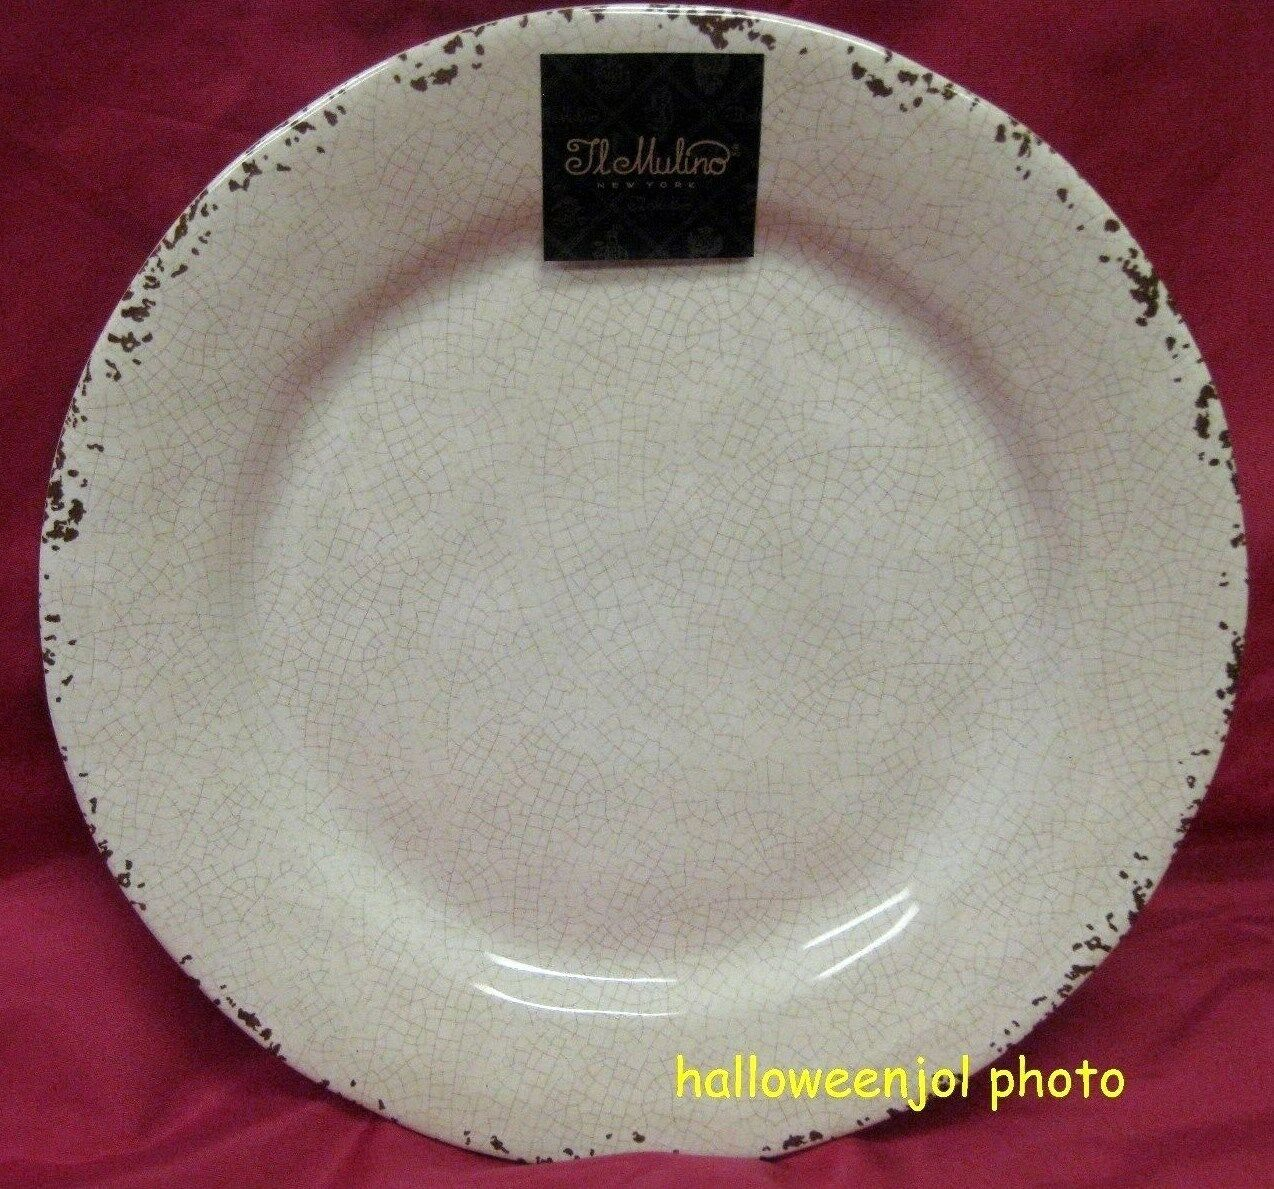 IL MULINO CREAM BEIGE RUSTIC MELAMINE  SIDE SALAD PLATES 9  Set of 4 NEW